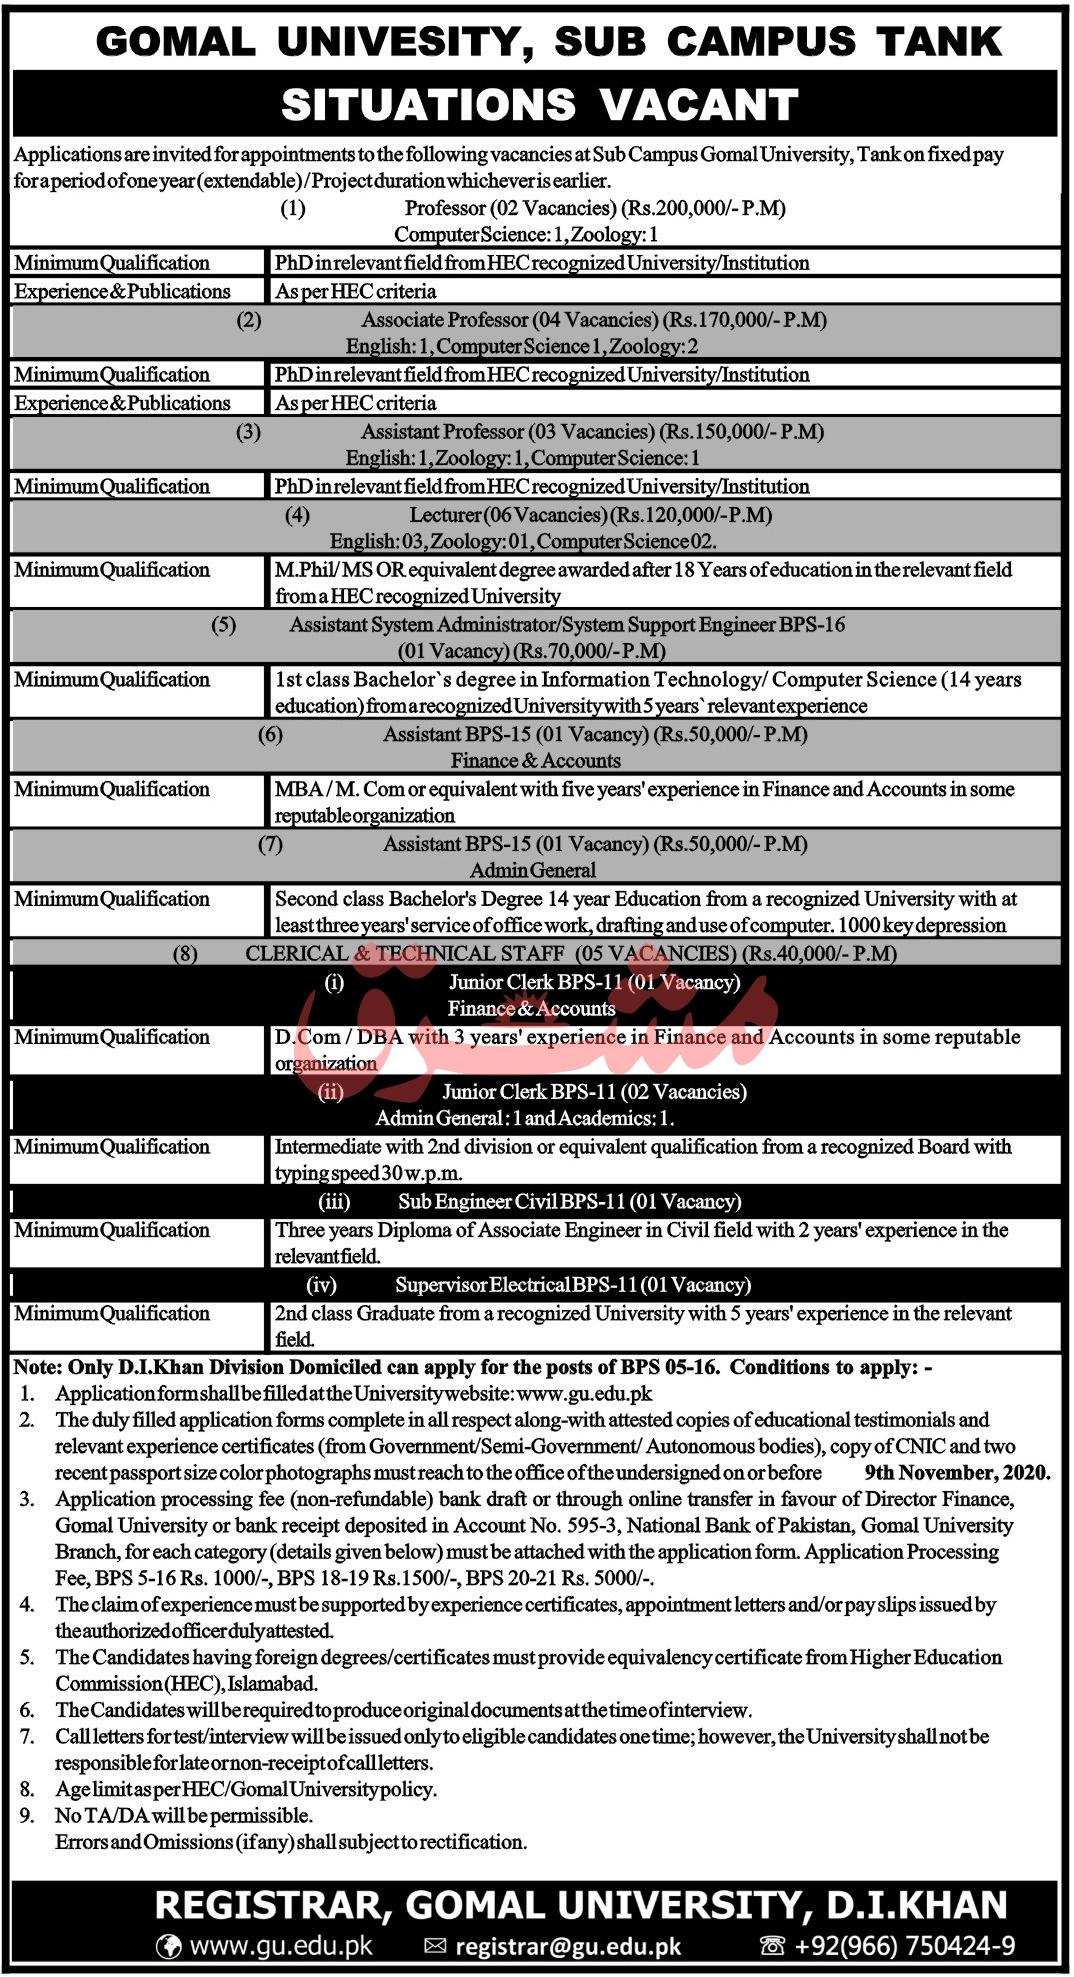 Gomal University Tank Campus Jobs 2020